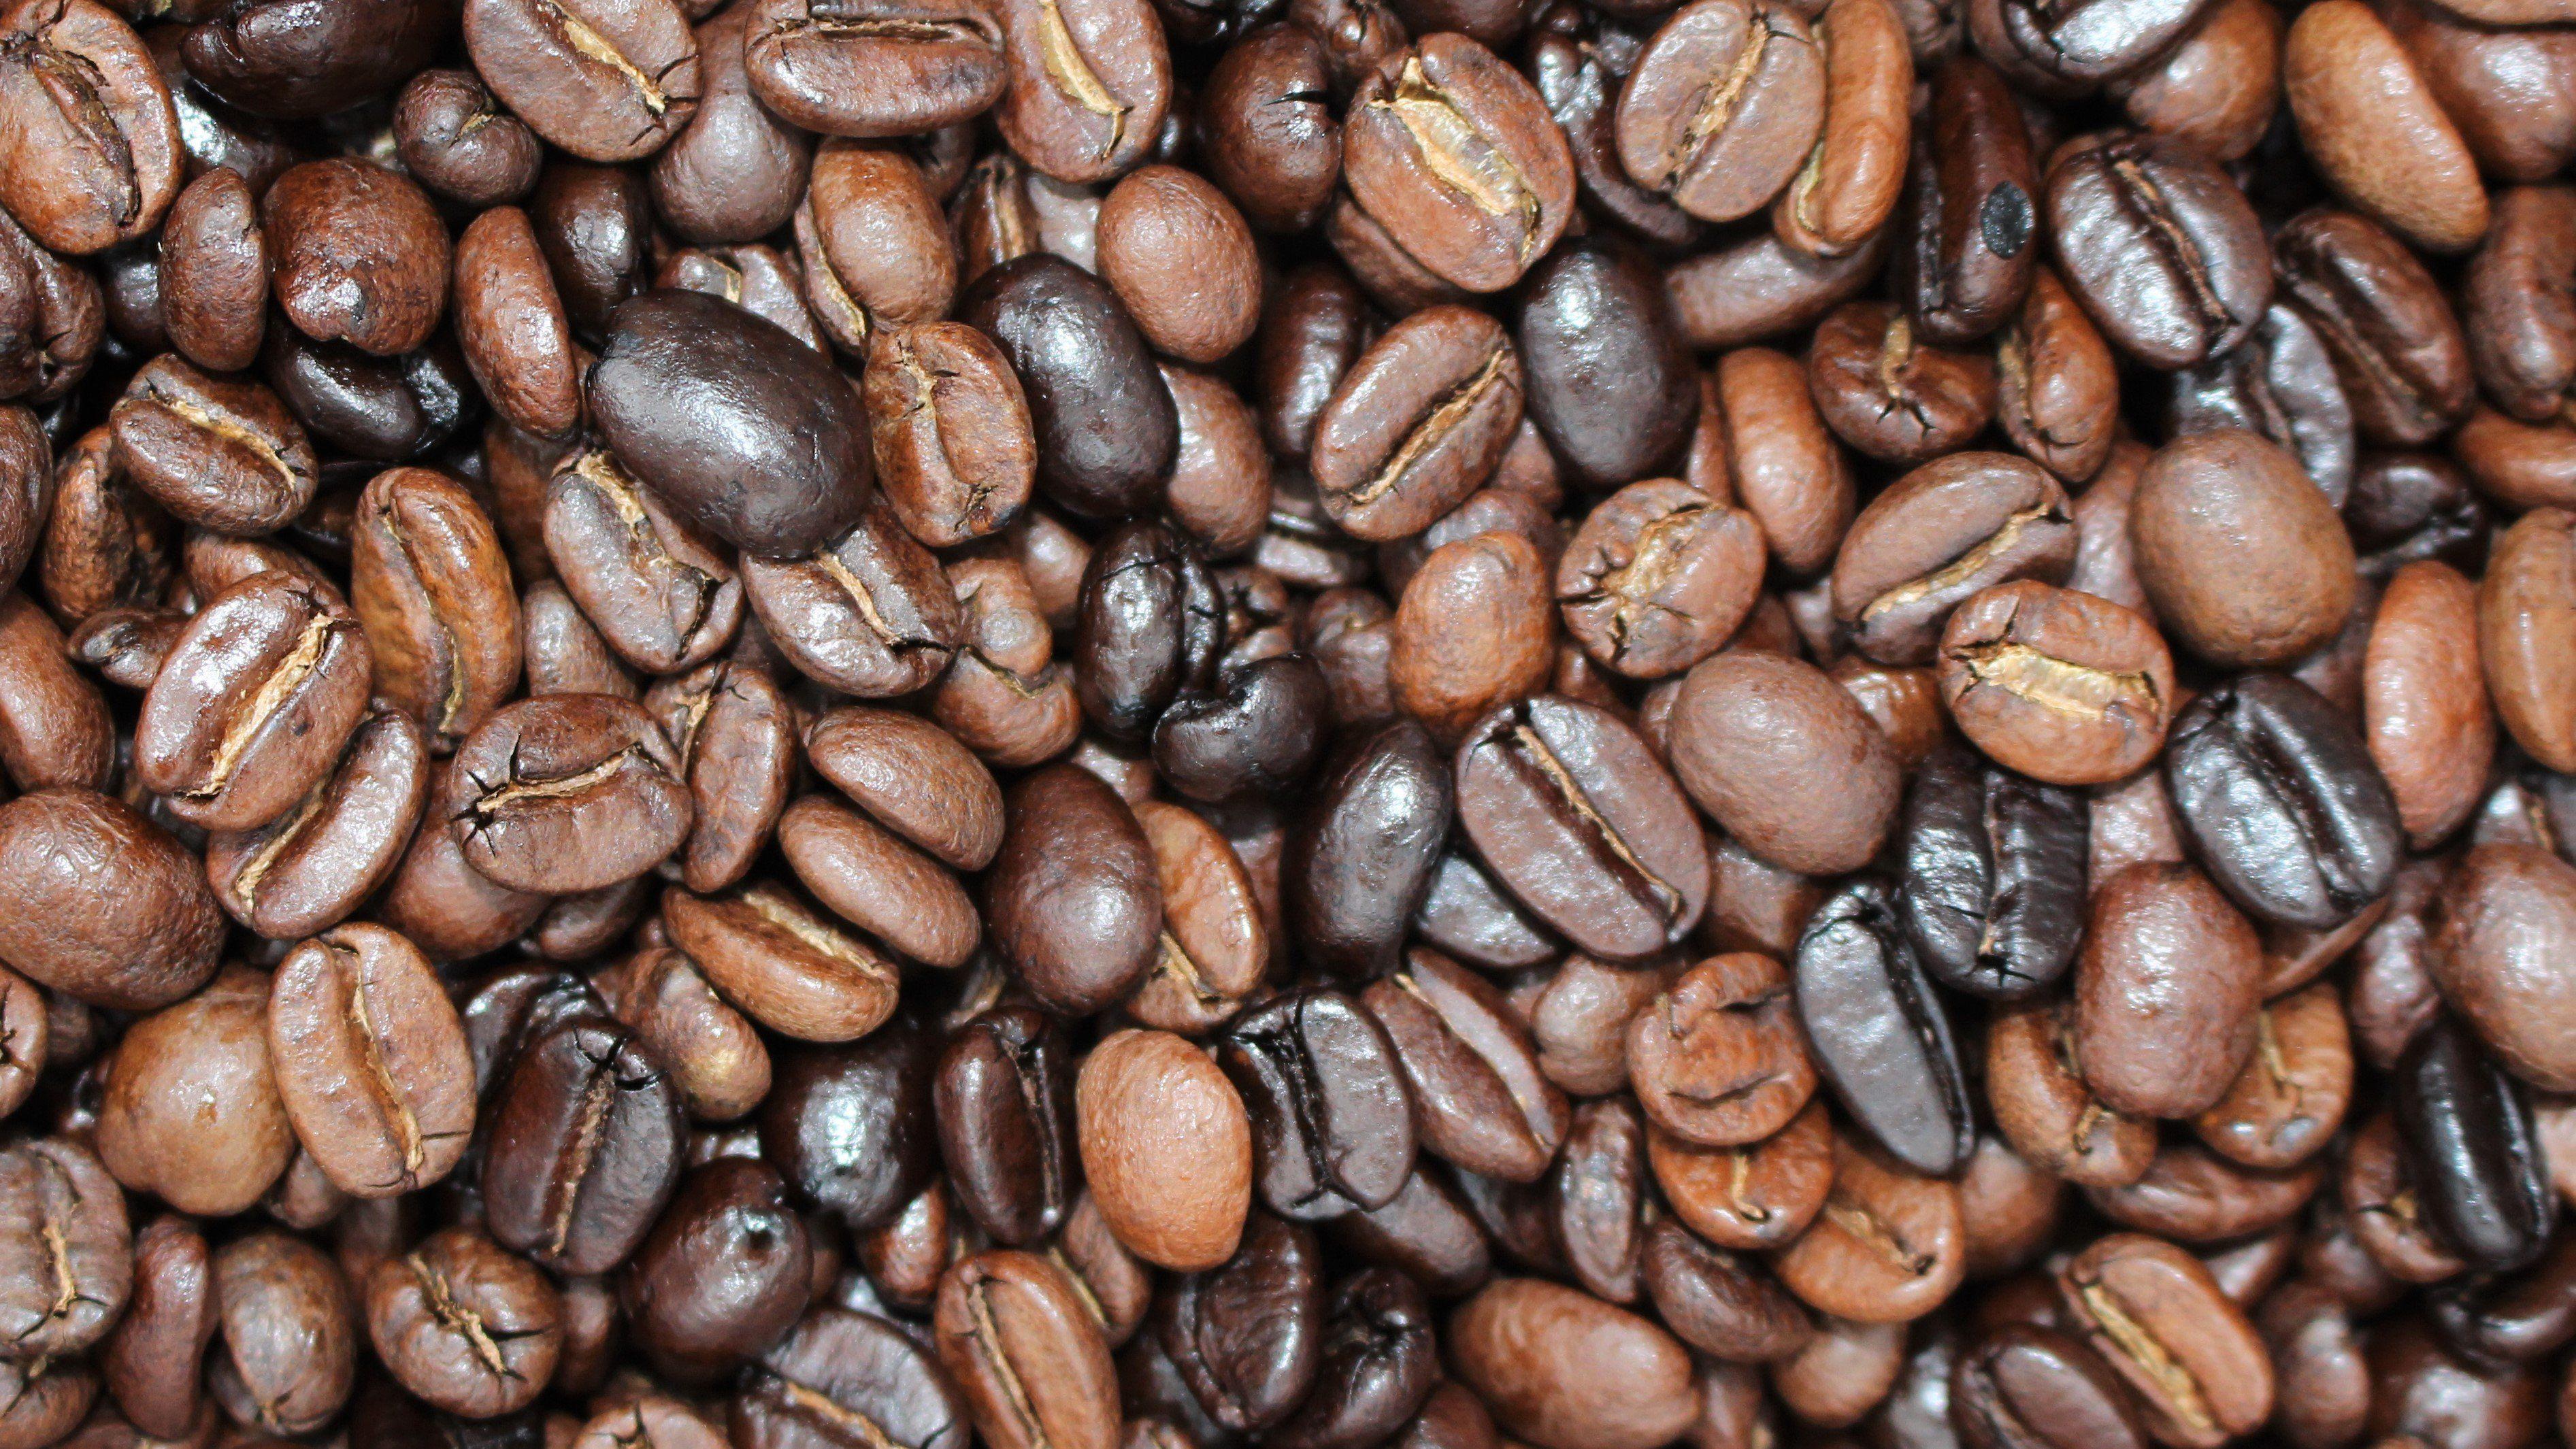 Wake Up Eufaula 1 LB Discount coffee, Beans, Food